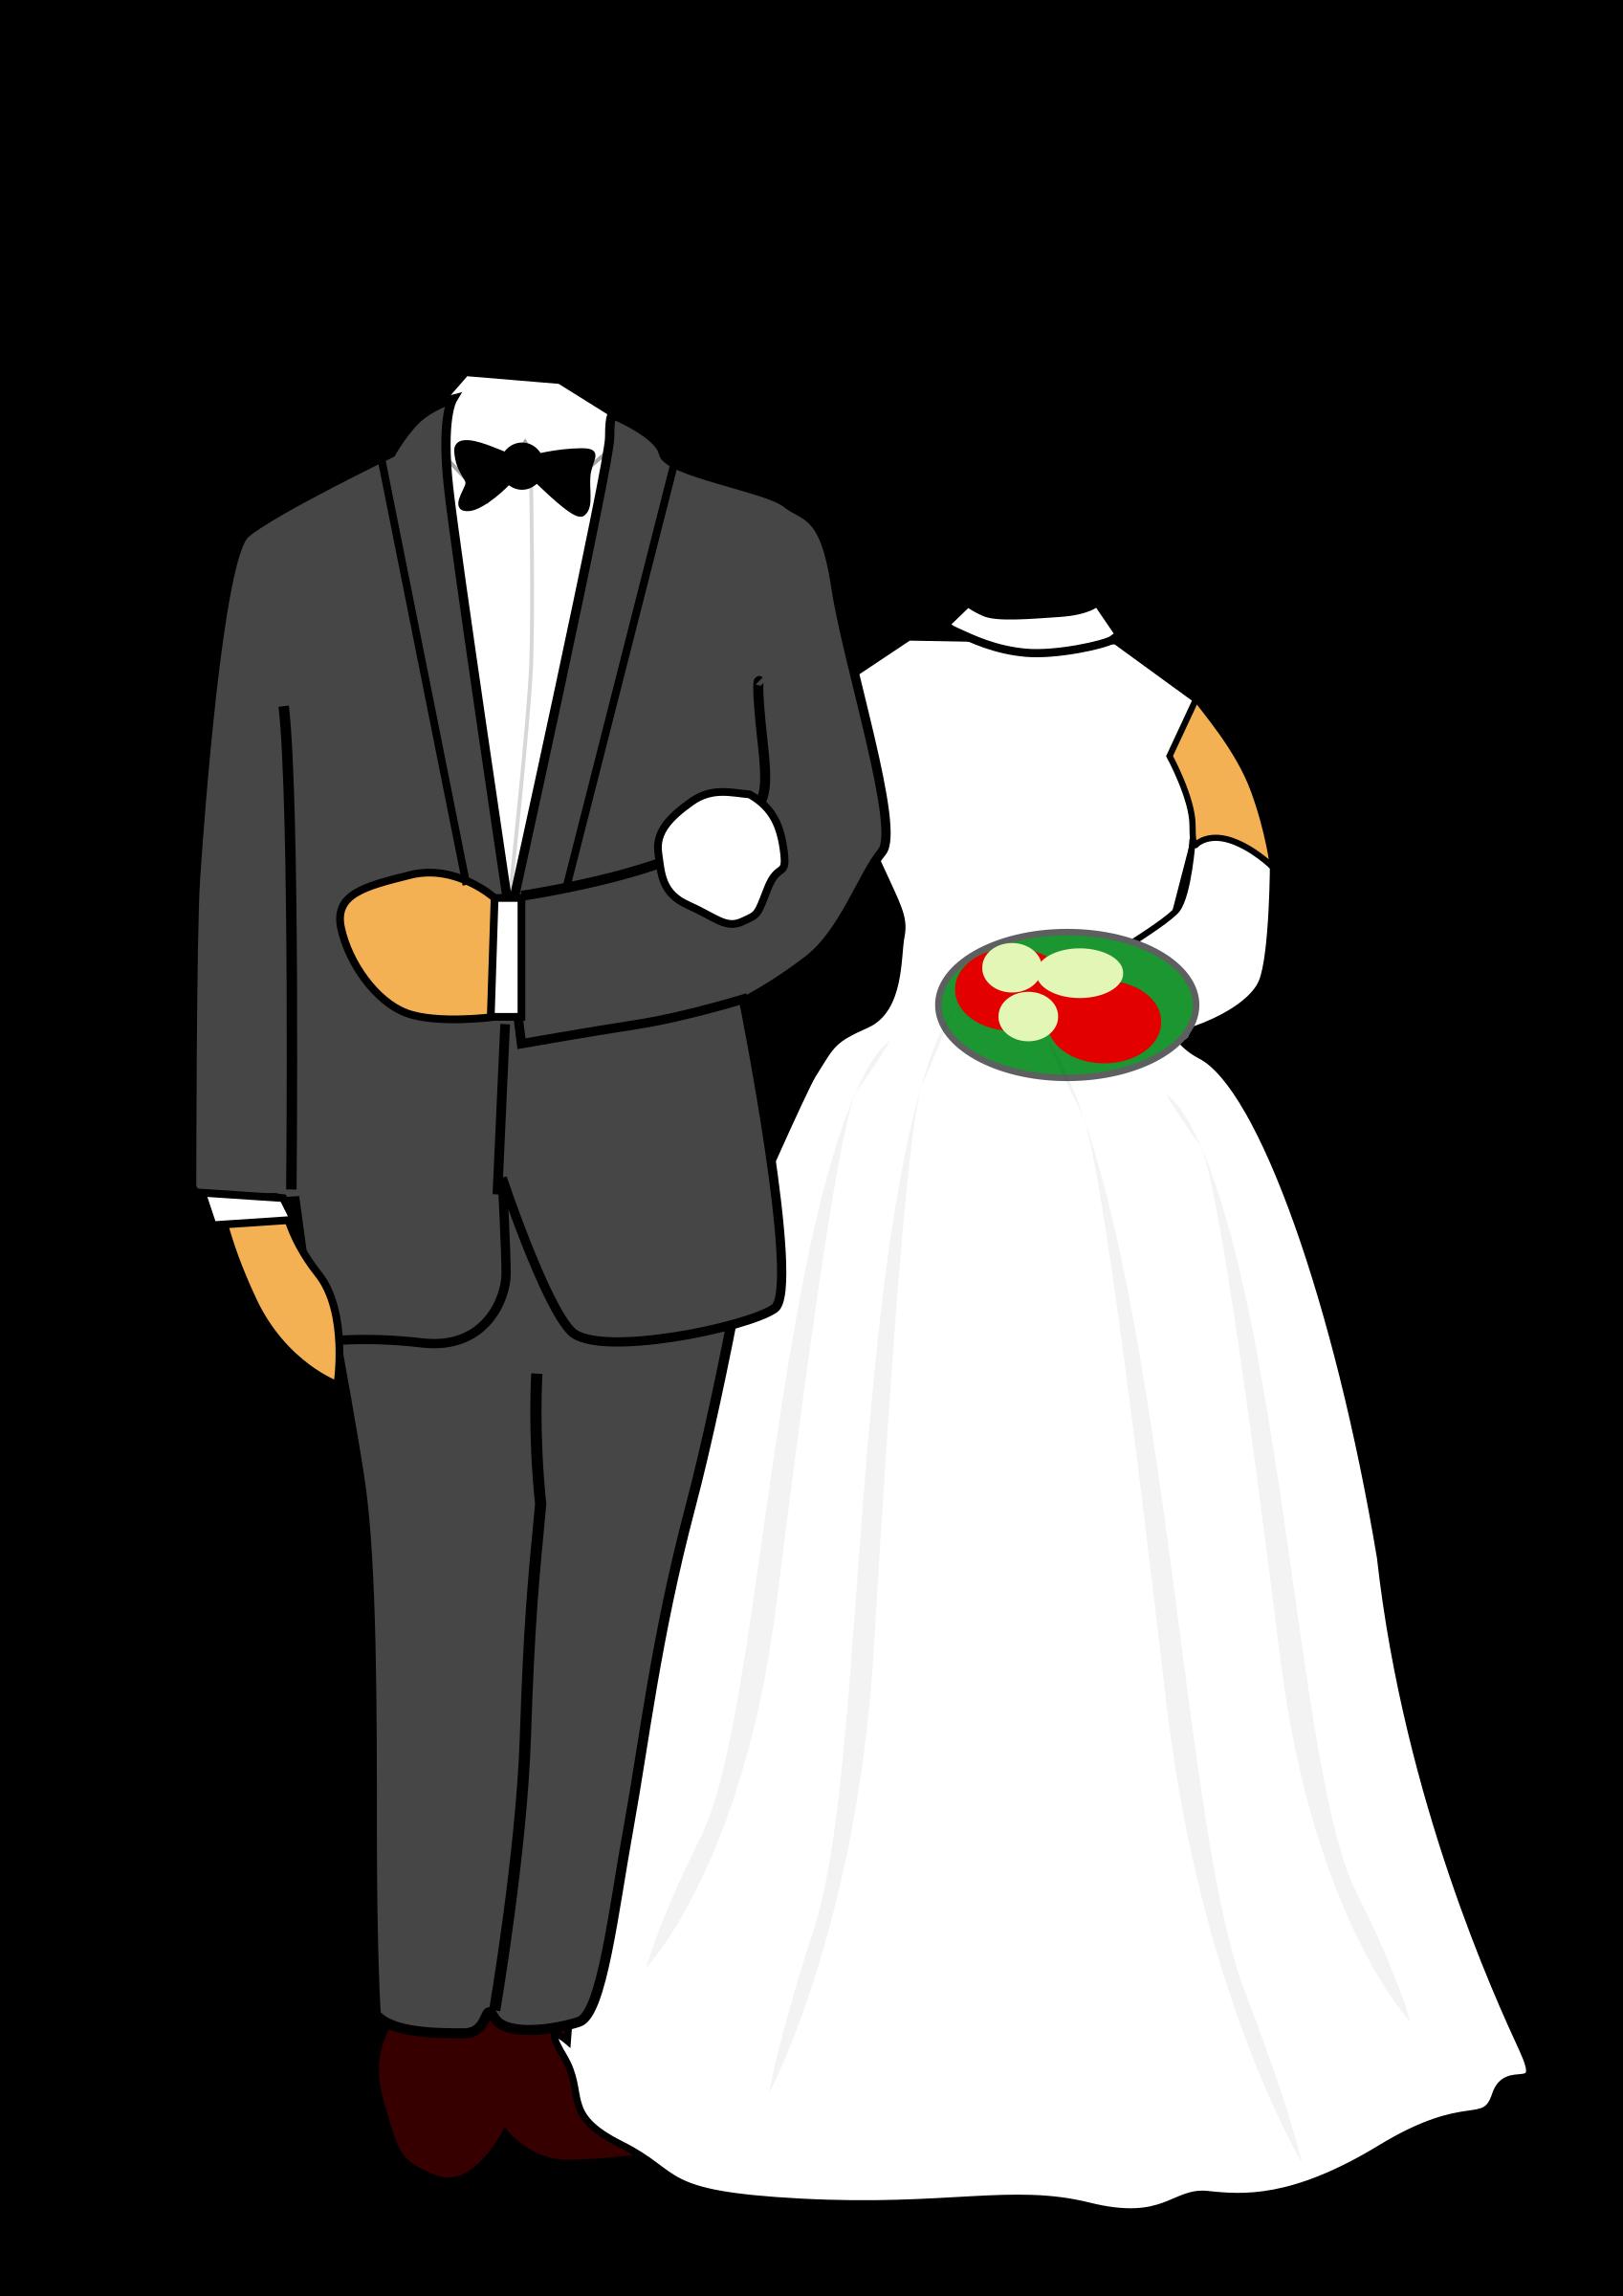 Tuxedo free on dumielauxepices. Groom clipart icon